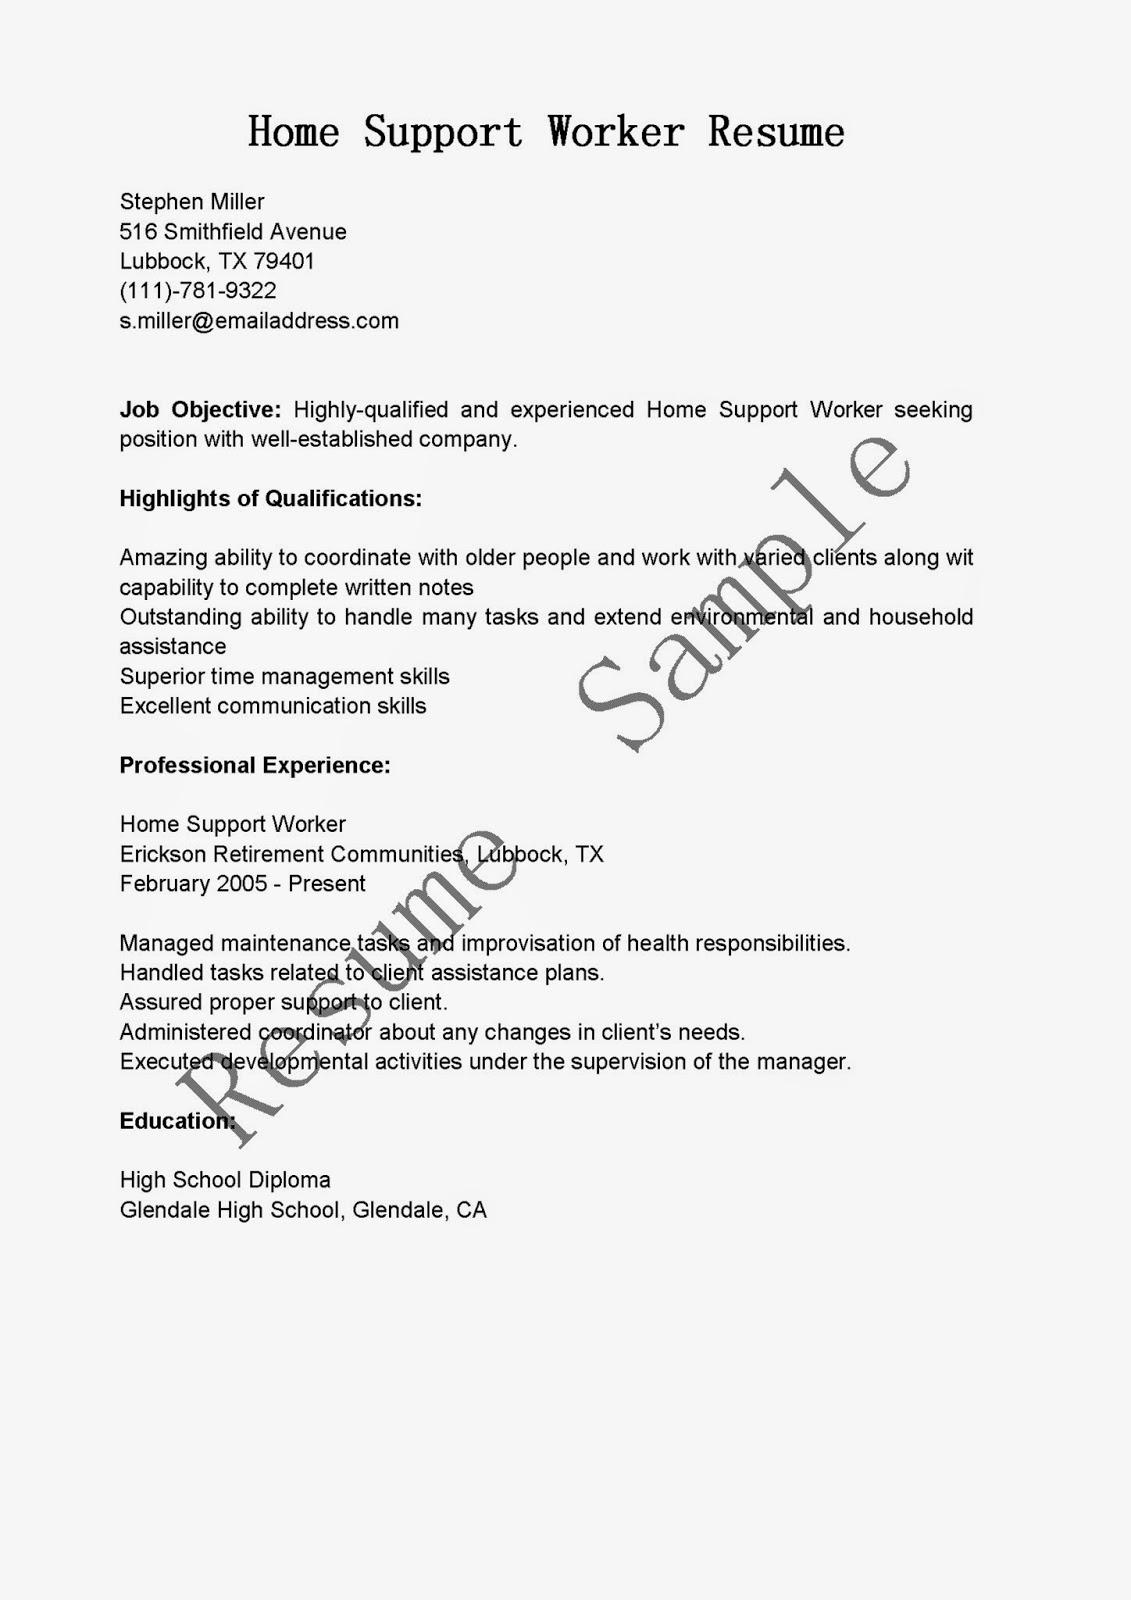 Resume Samples Home Support Worker Resume Sample